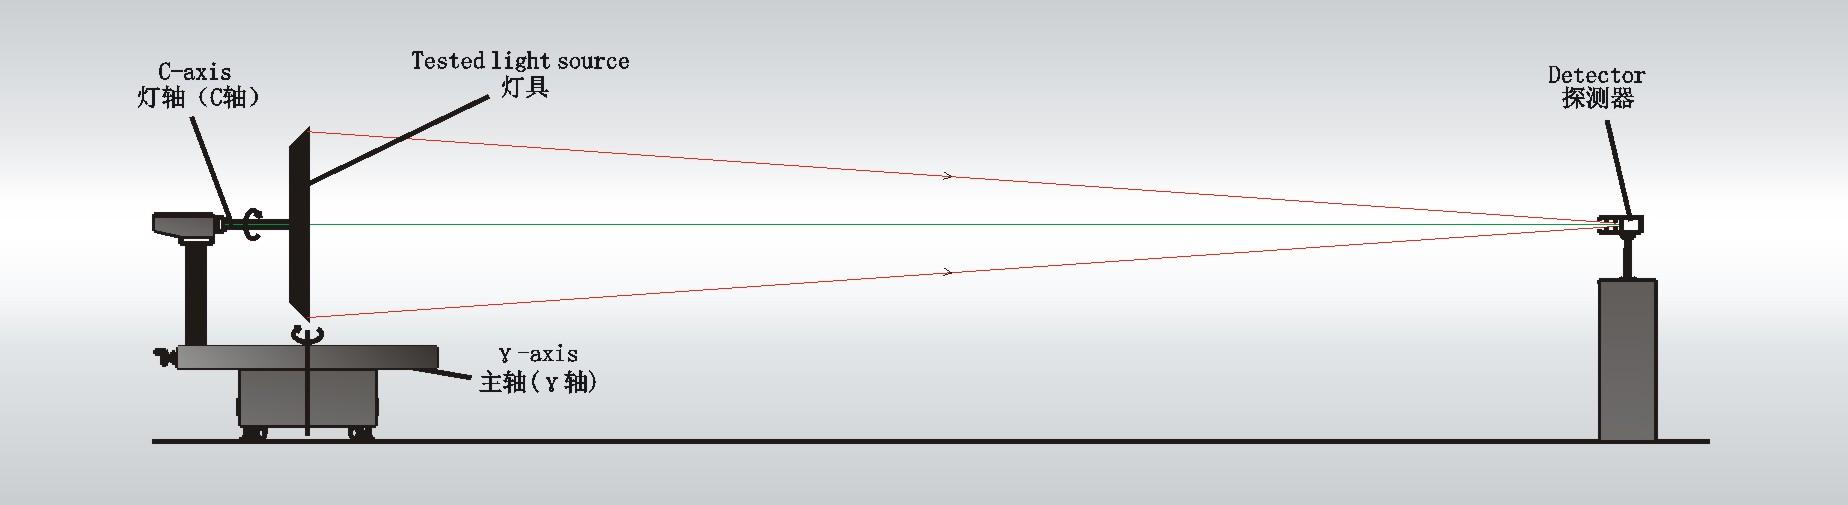 GPM-1800B 分布光度计工作原理图.jpg